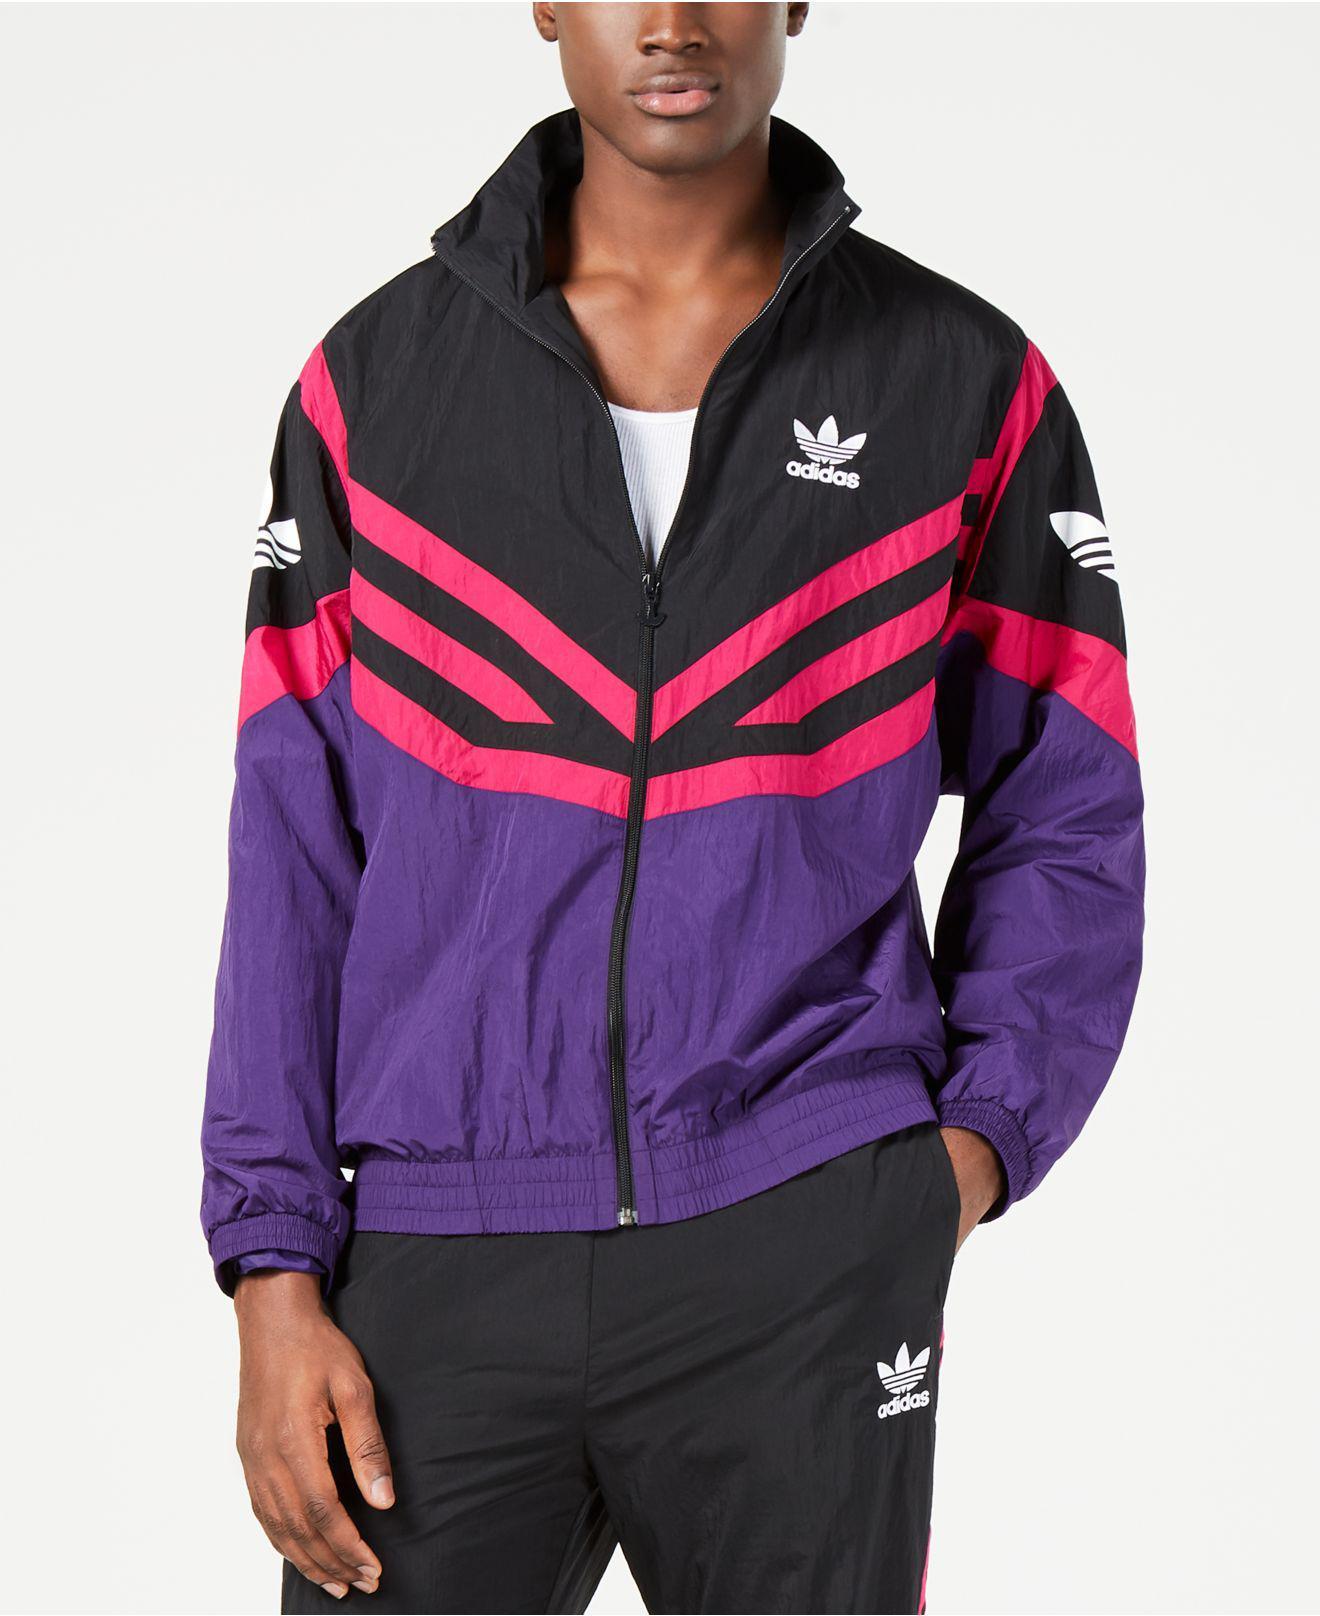 86449b0eafd Adidas - Purple Originals Sportive Colorblocked Track Jacket for Men -  Lyst. View fullscreen